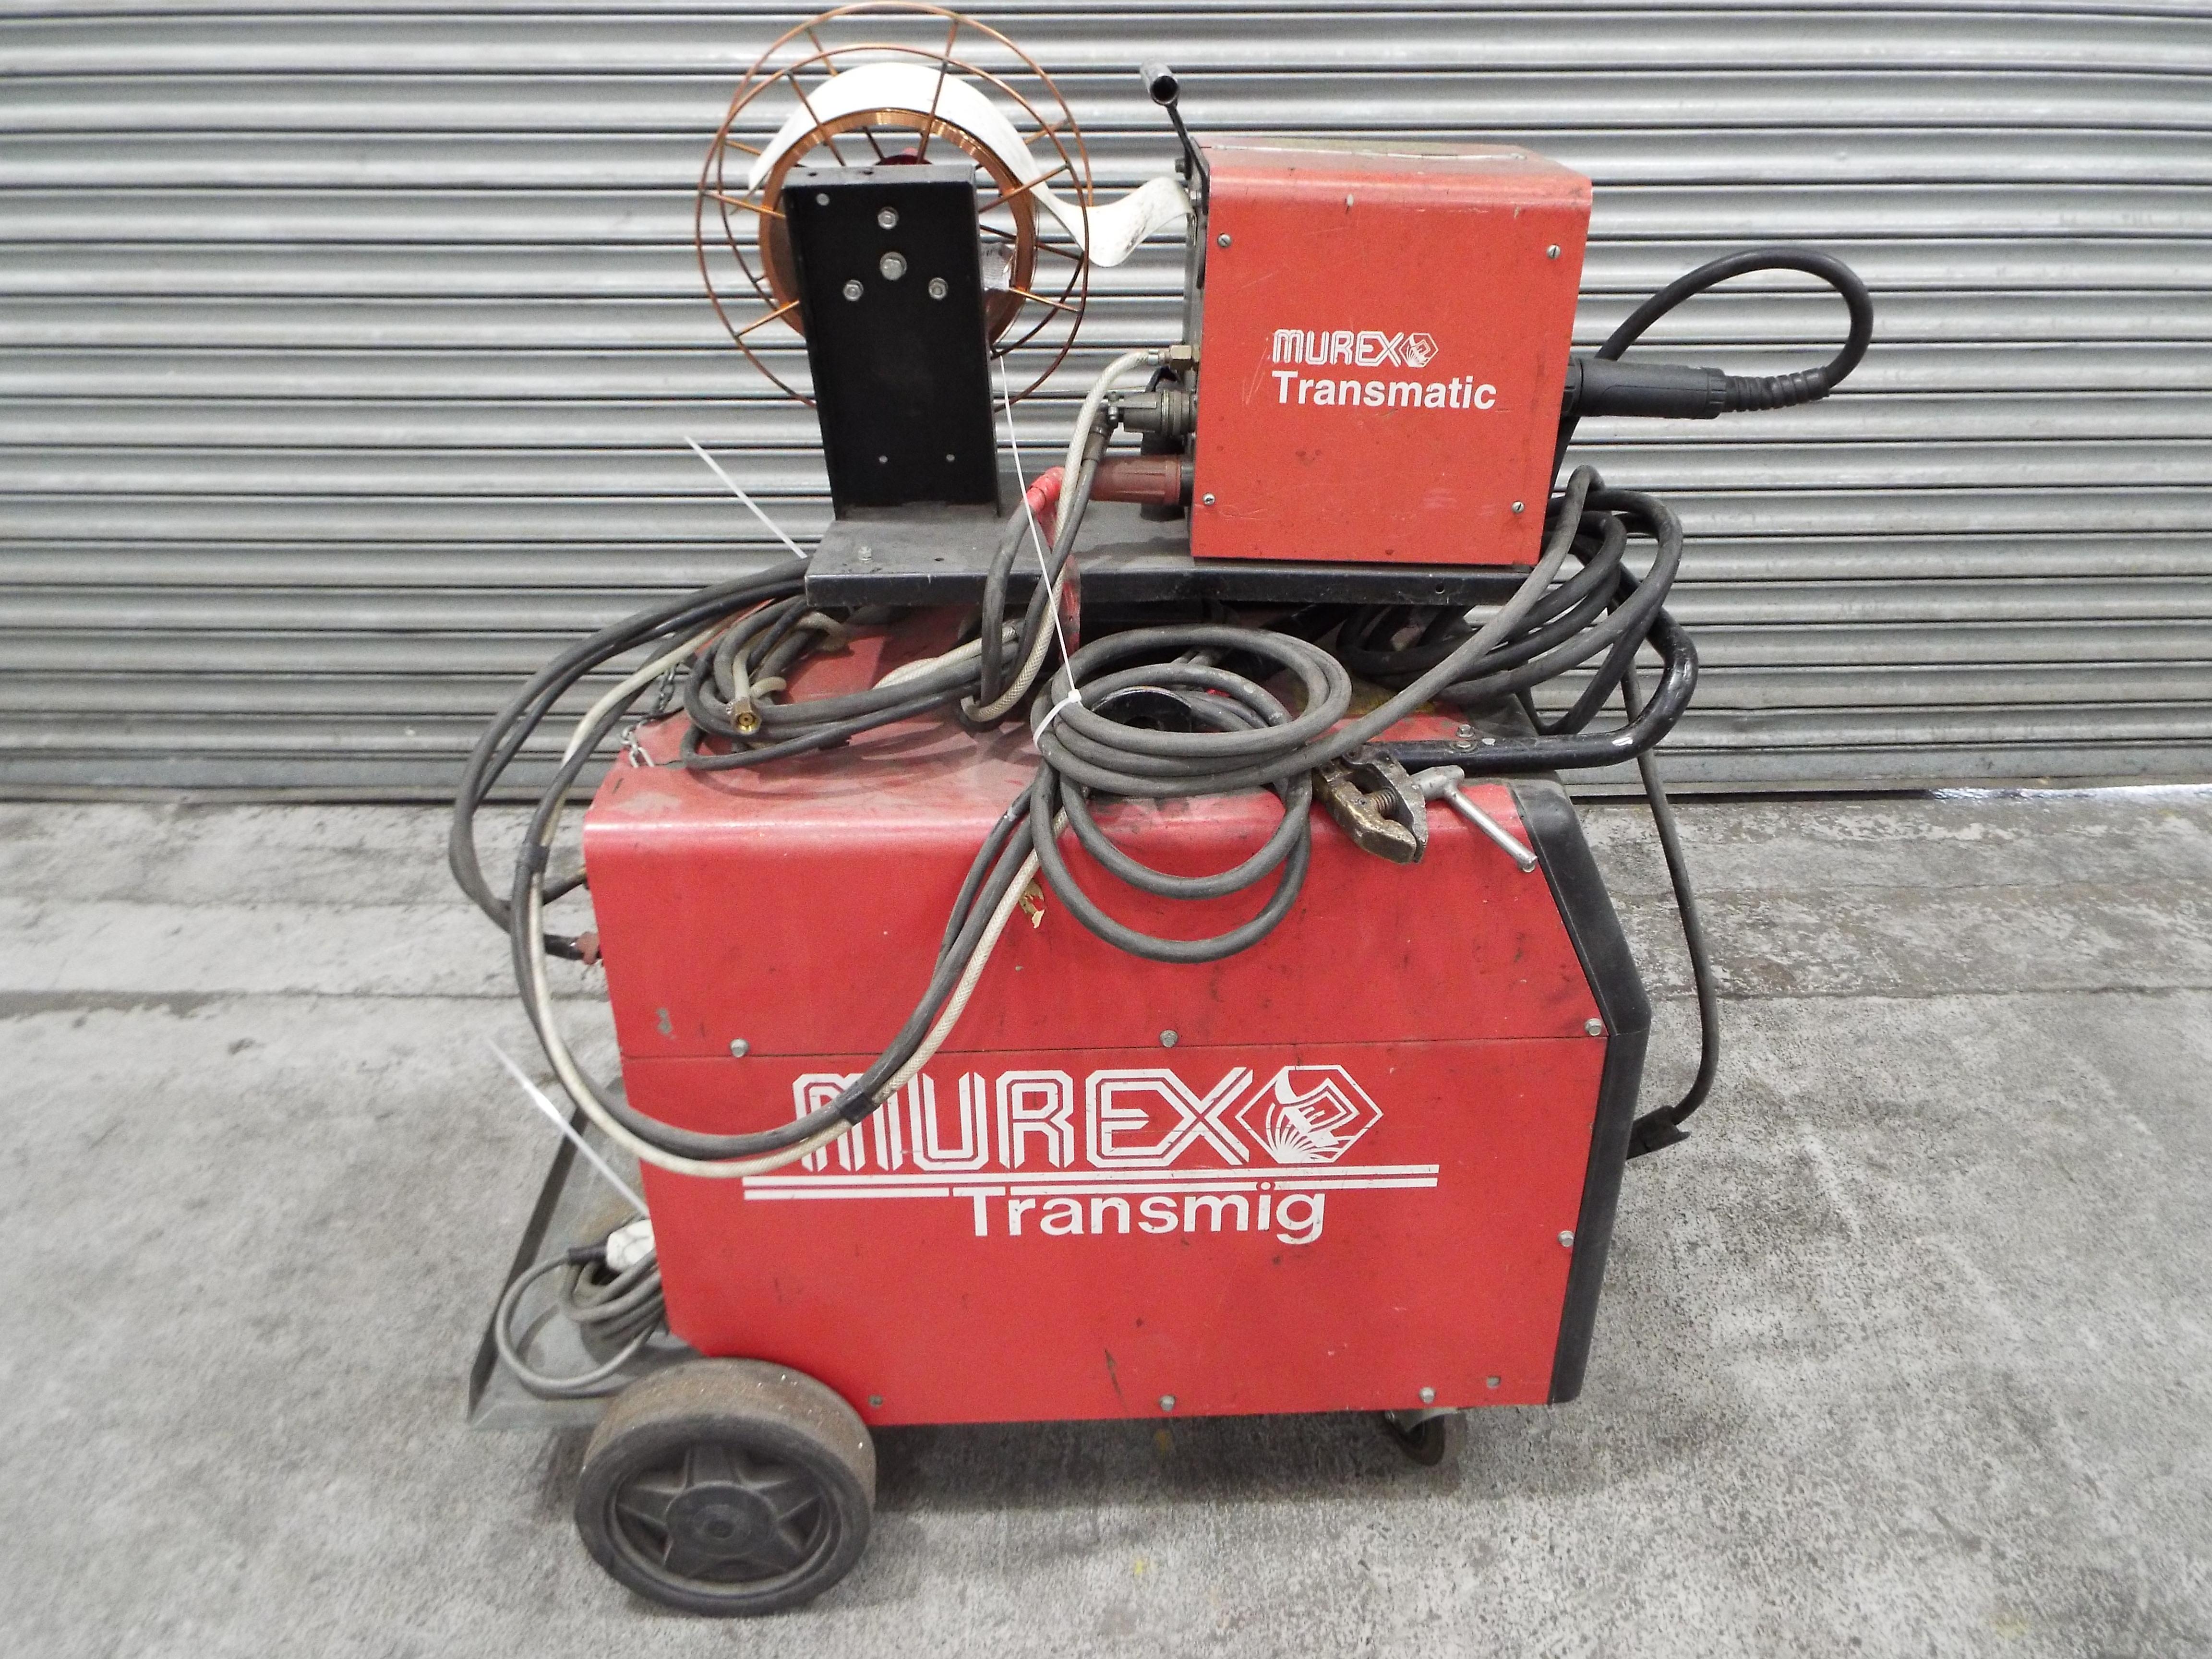 Lot 14 - Murex Transmig Weld Set complete with a Murex Transmatic 2 x 2